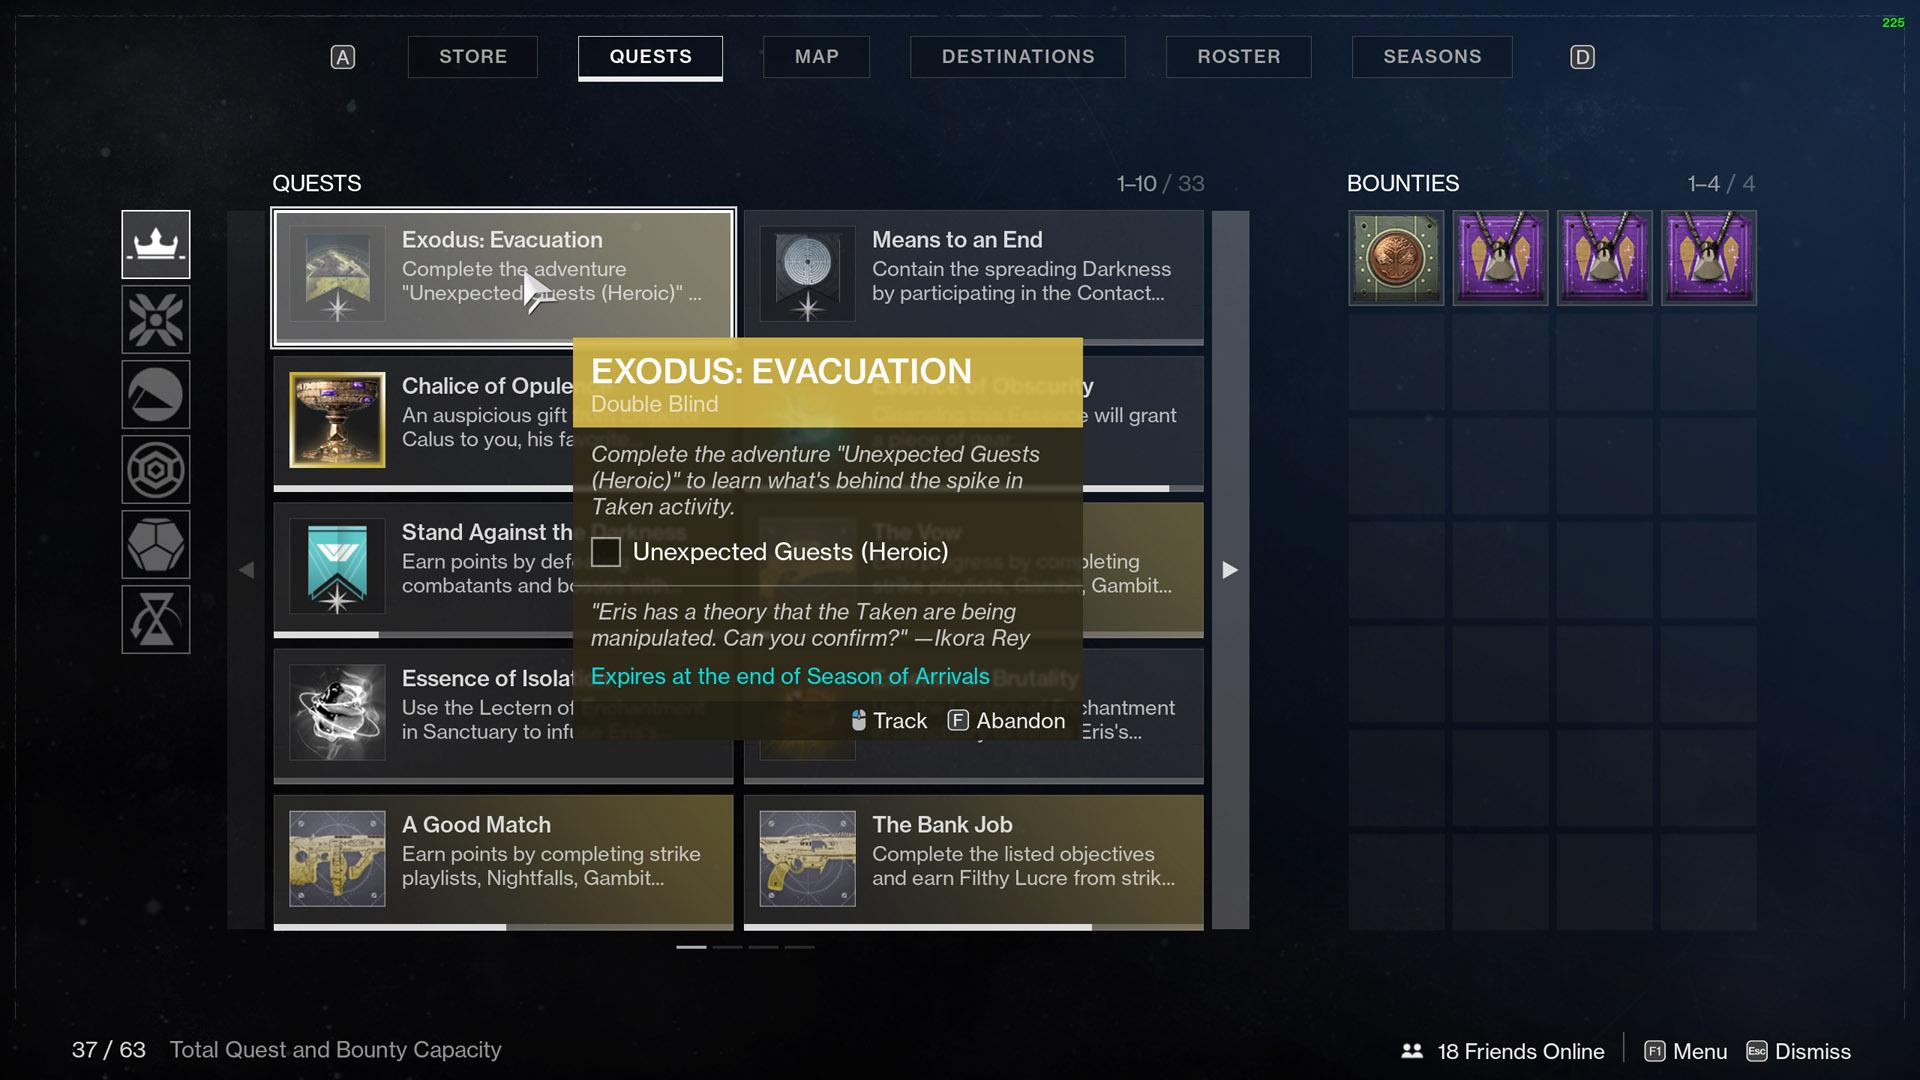 Destiny 2 Exodus Evacuation Double Blind